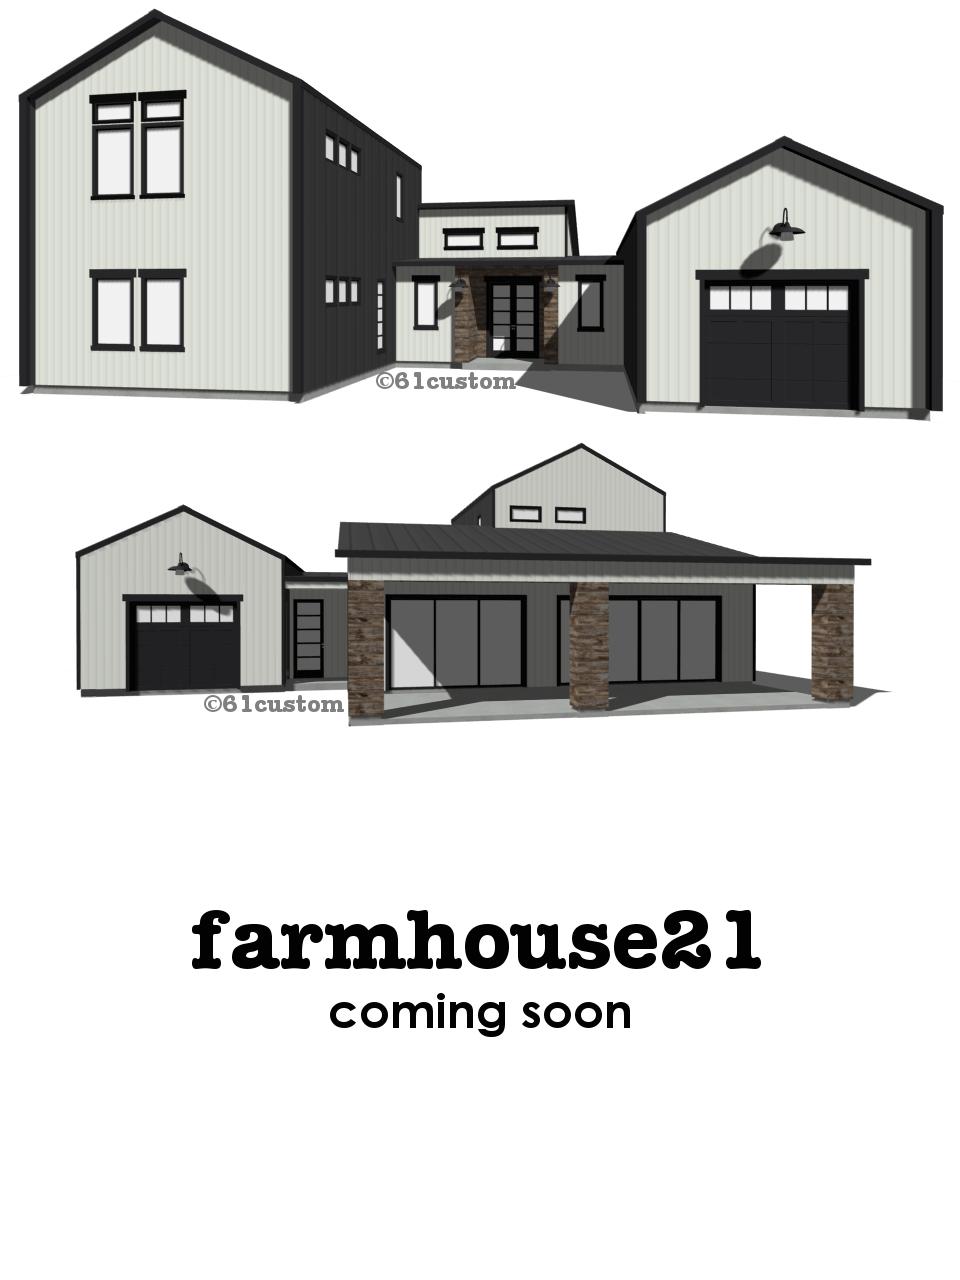 farmhouse21: Modern Farmhouse Plan | 61custom